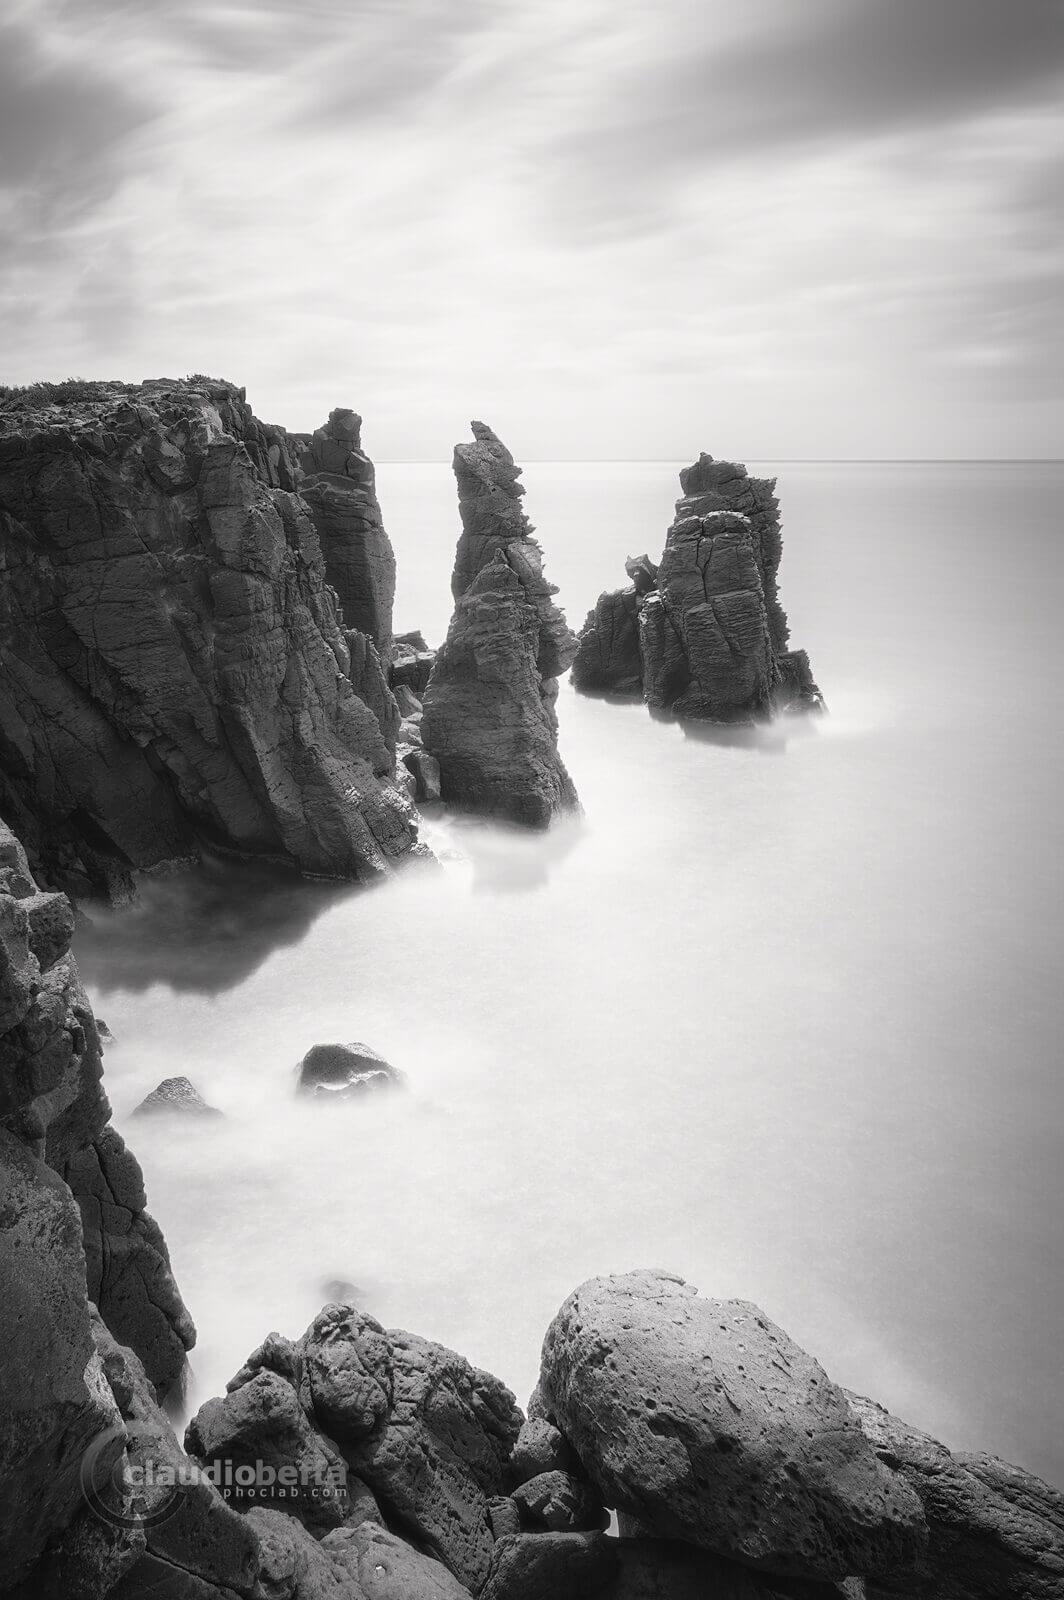 Floating pillars, landscape ,seascape, rocks, stones, pillars, sea, sardinia, italy, long exposure, black and white